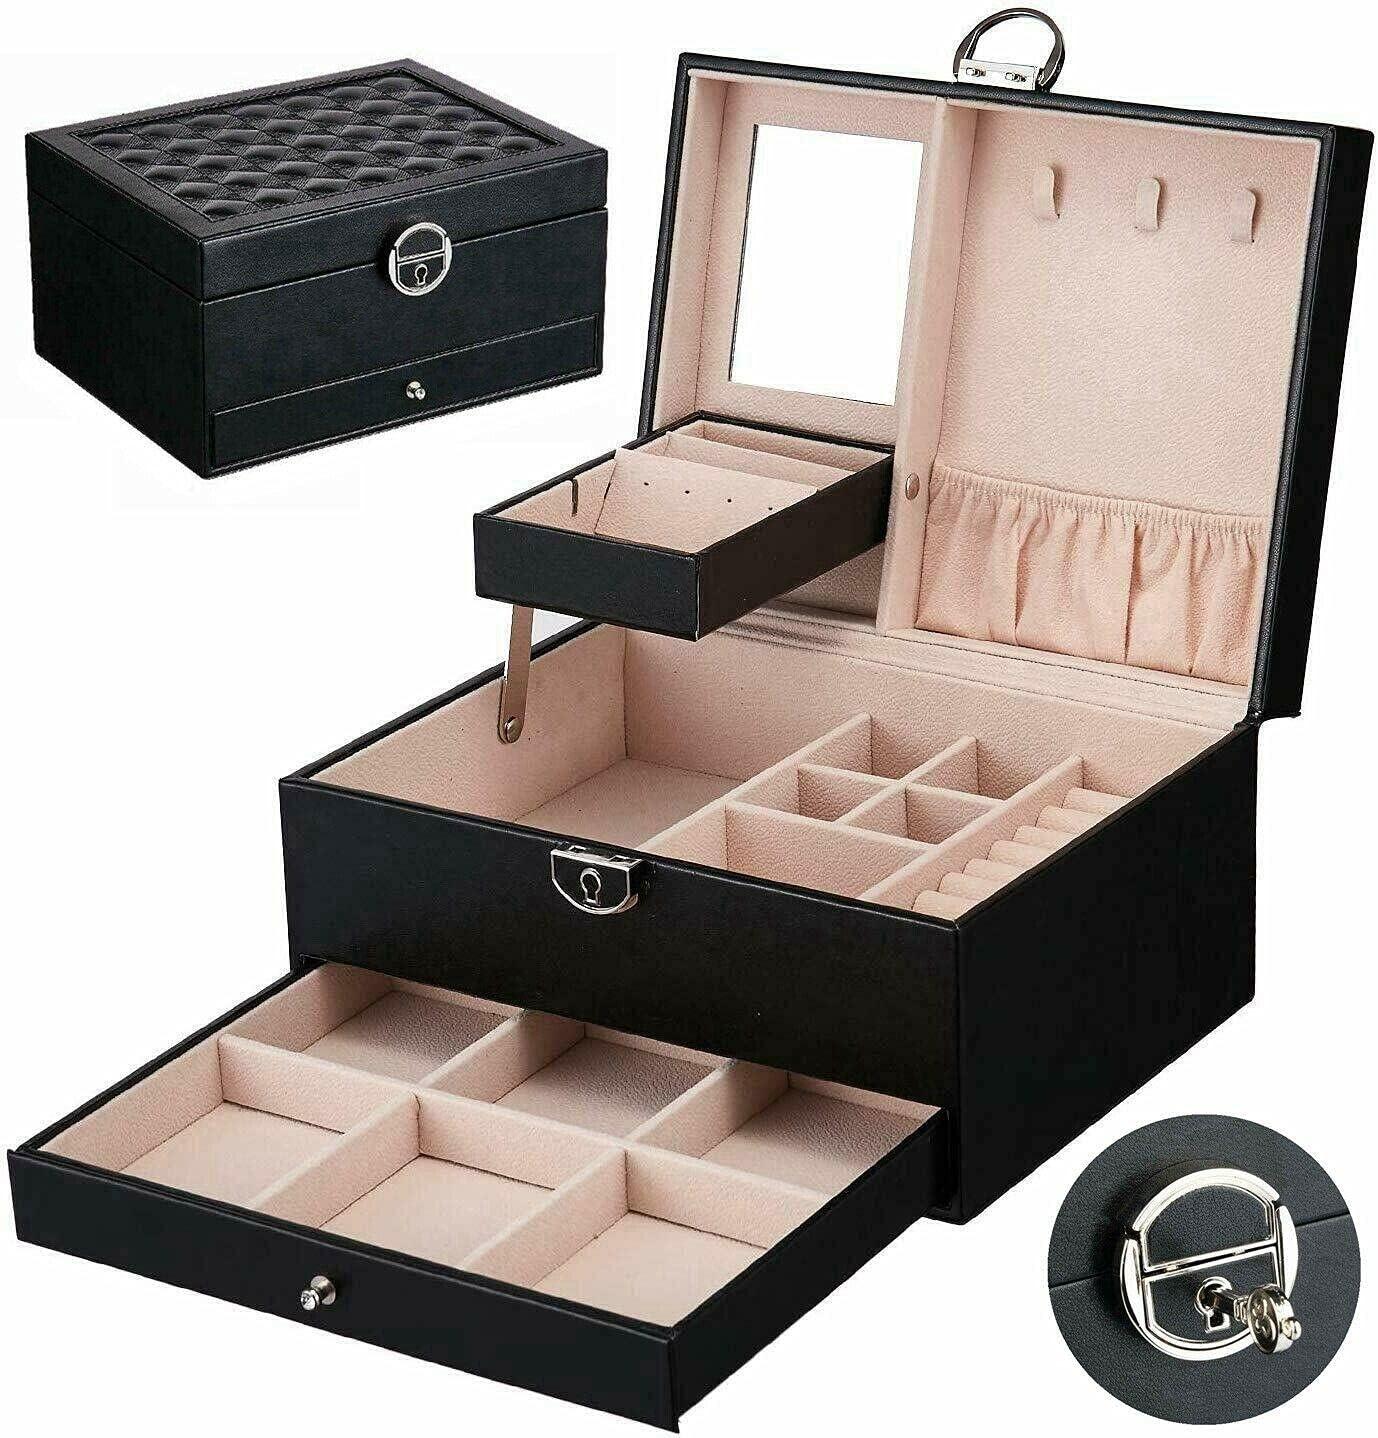 2 Layer New York Mall PU Leather Jewelry Box Display Max 82% OFF Storage Organizer Mi with